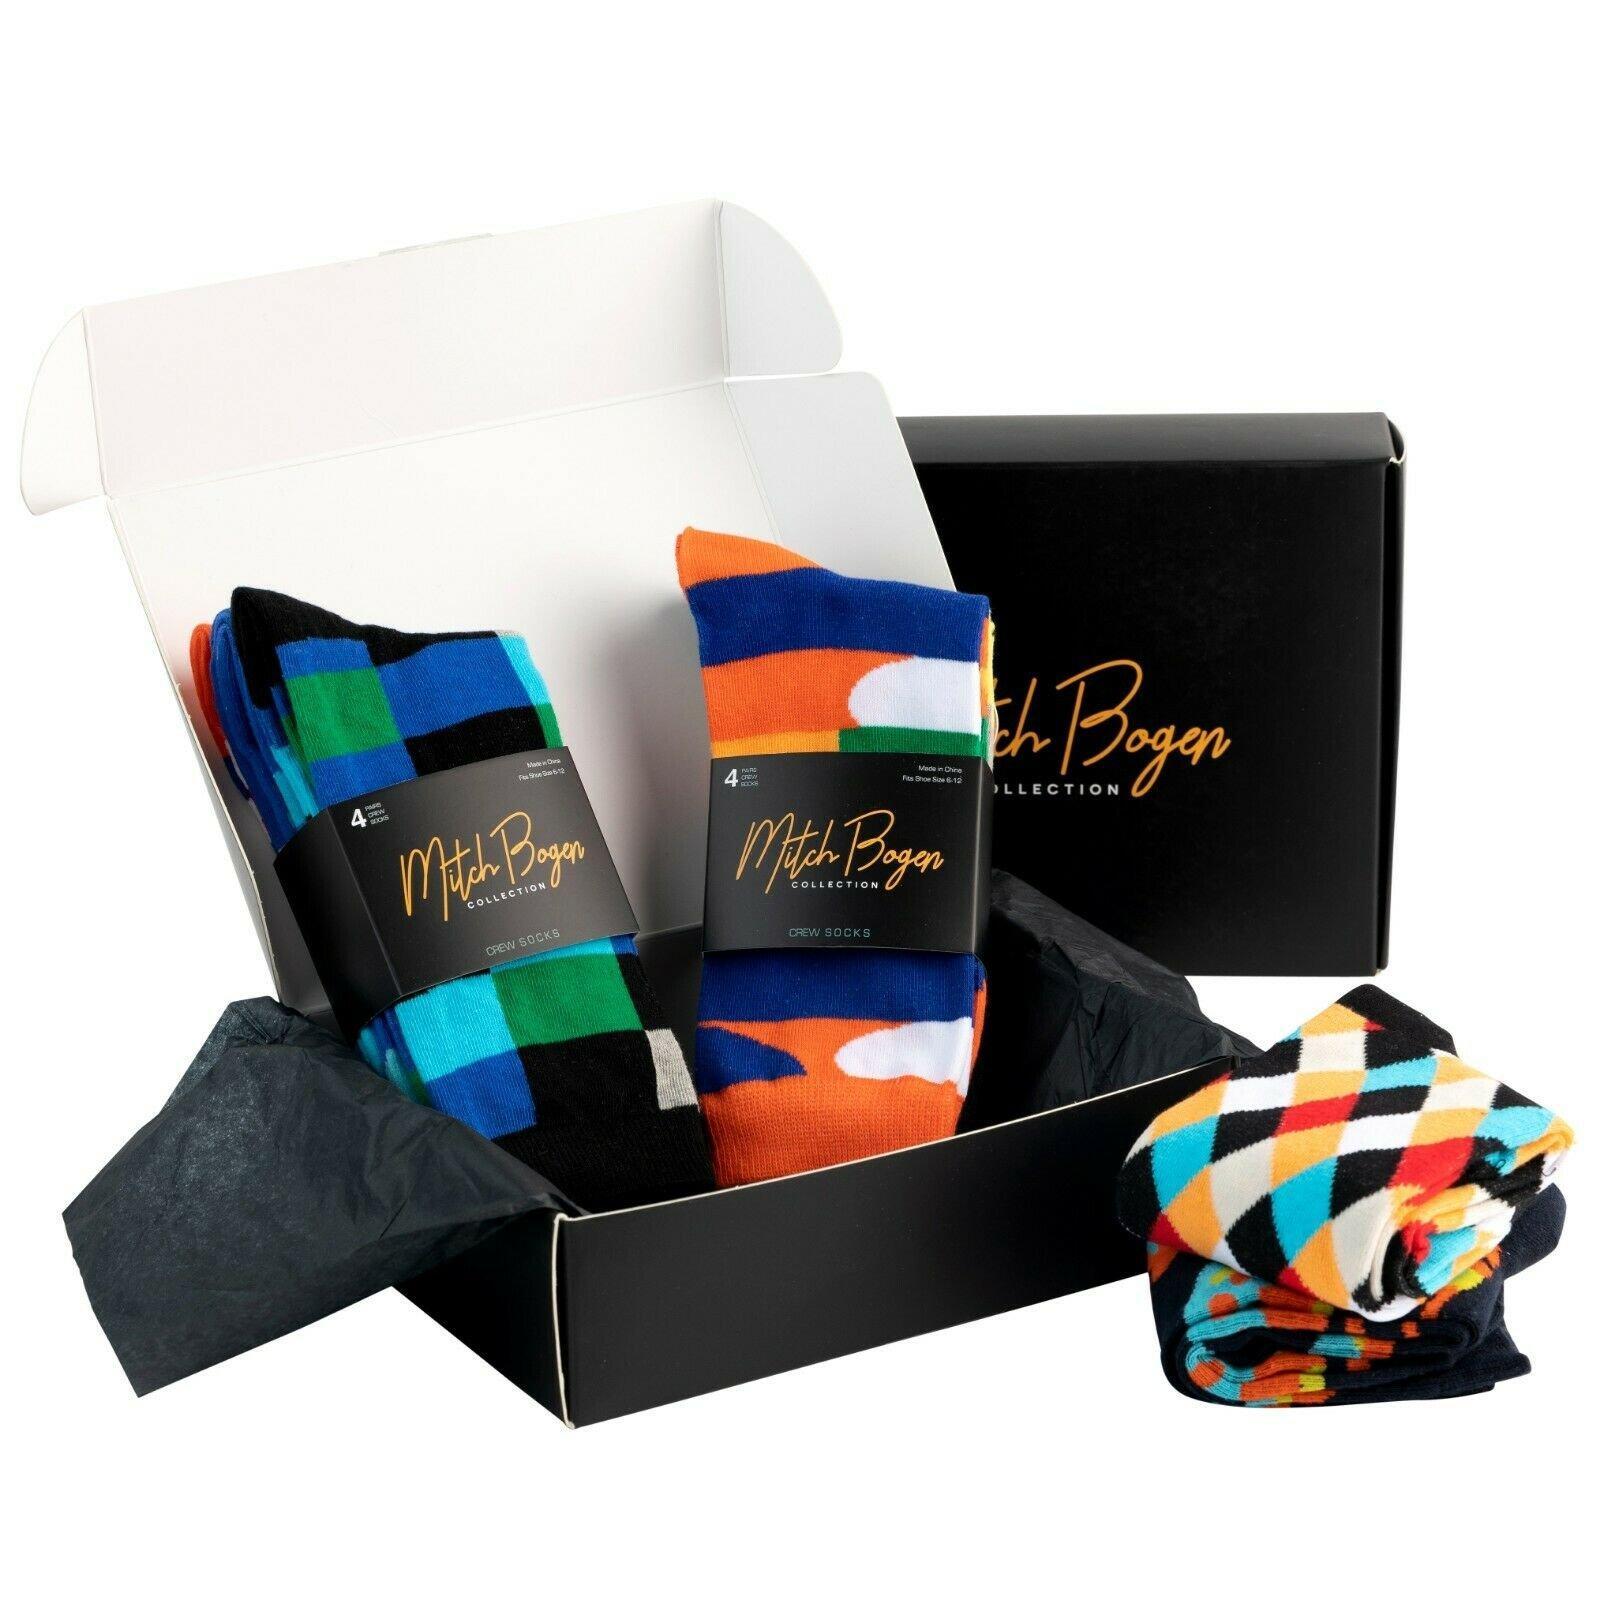 Mitch-Bogen-Mens-Cotton-Dress-Socks-Colorful-Fashion-Crew-Socks-8-Pack-Gift-Box thumbnail 18